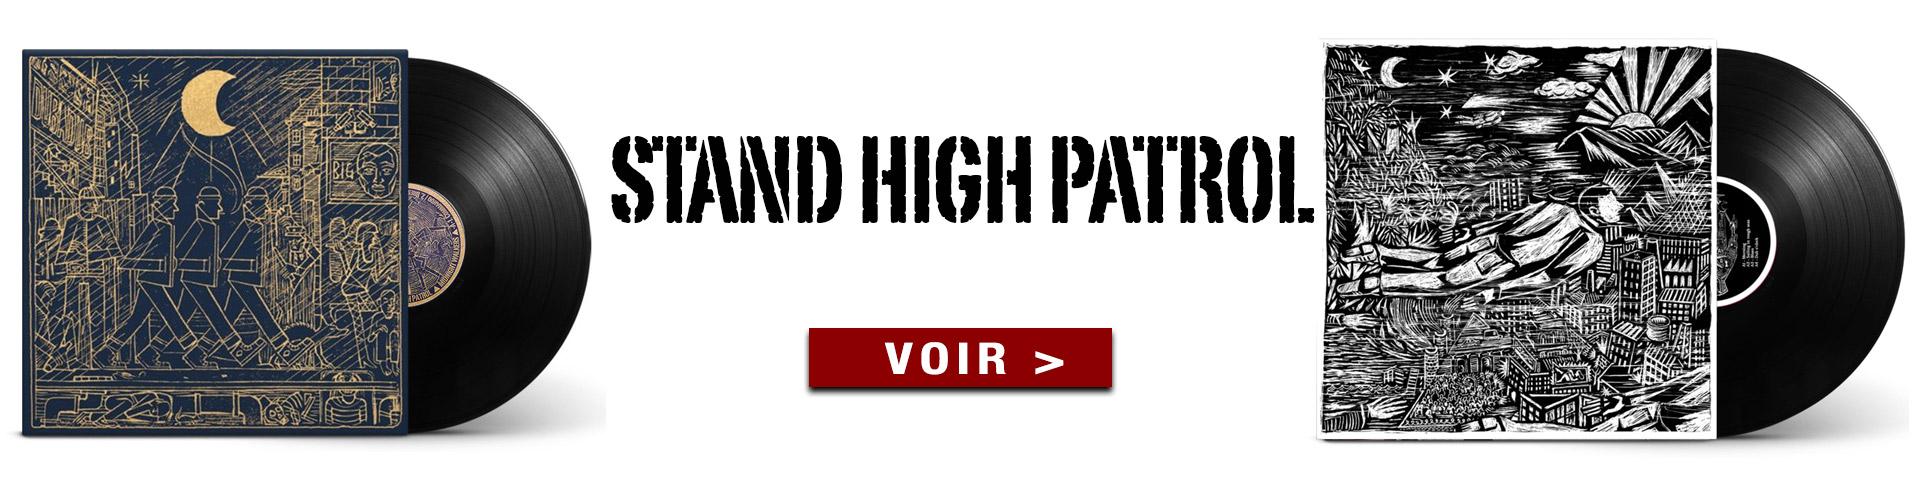 Stand-high-patrol-vinyles